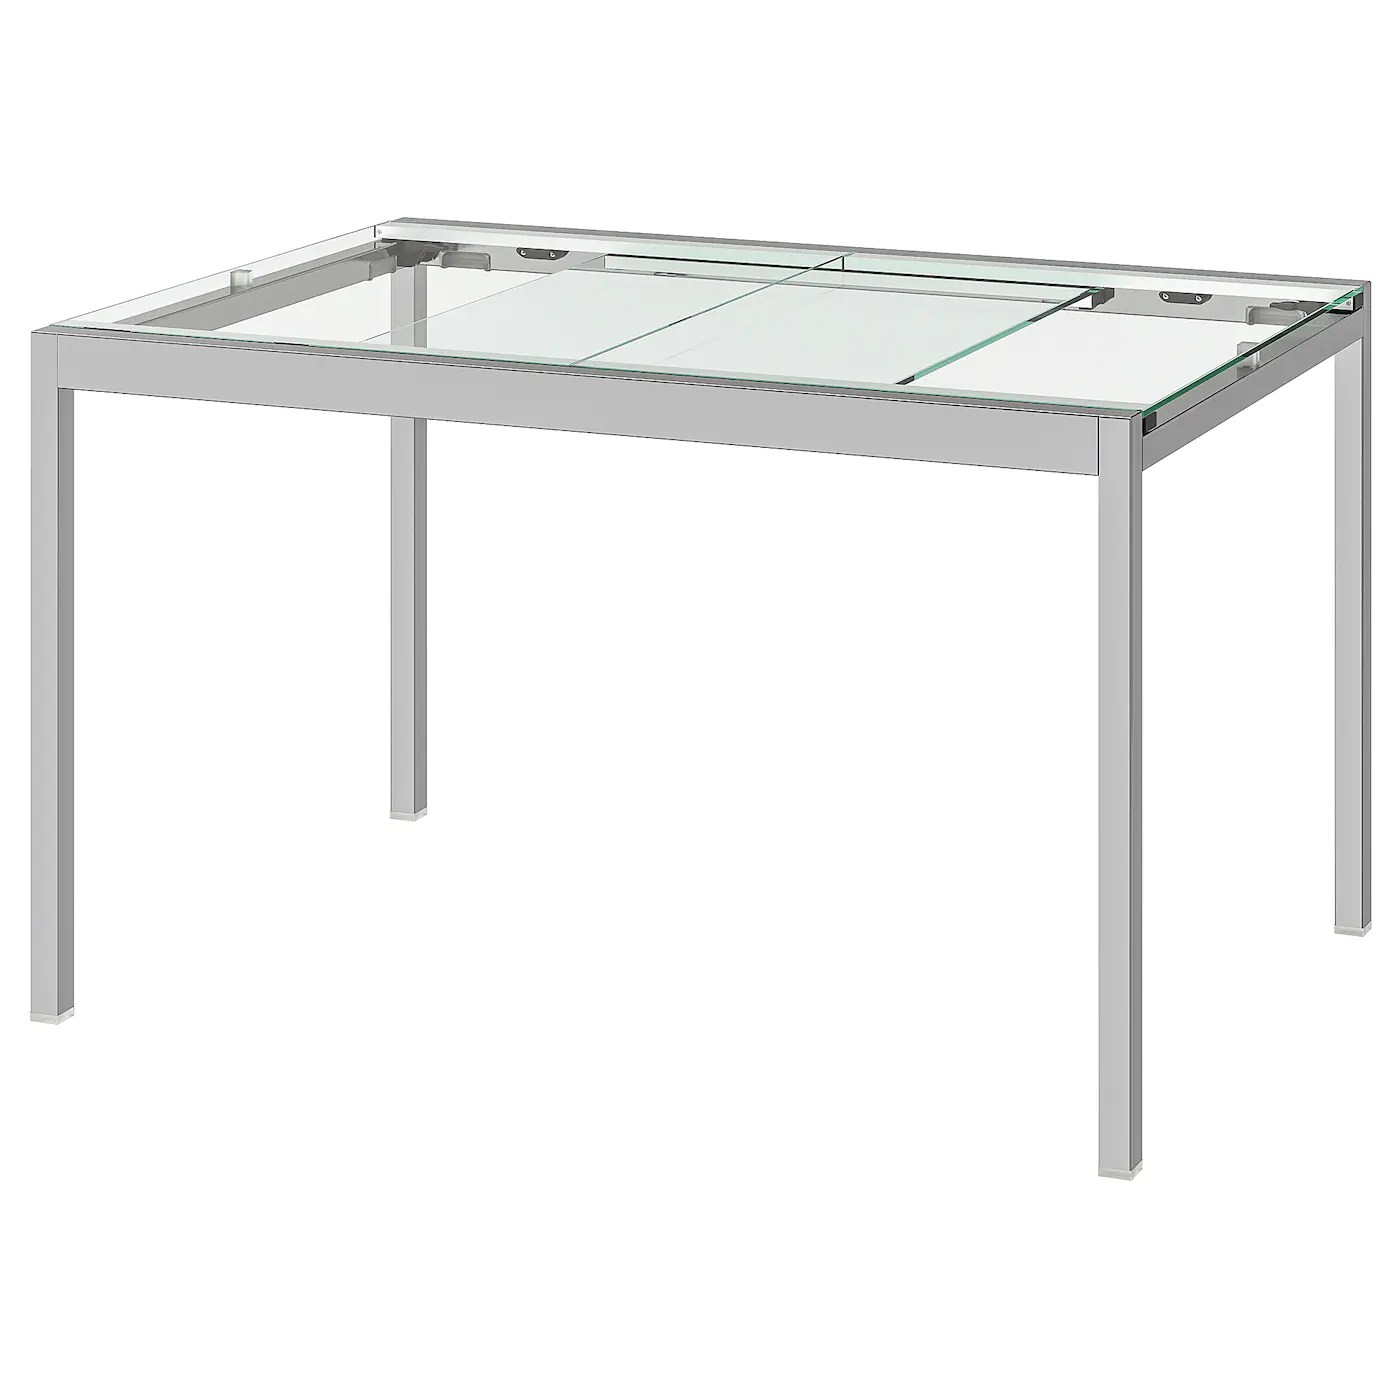 Glivarp Transparent Chrome Plated Extendable Table Length 125 Cm Ikea